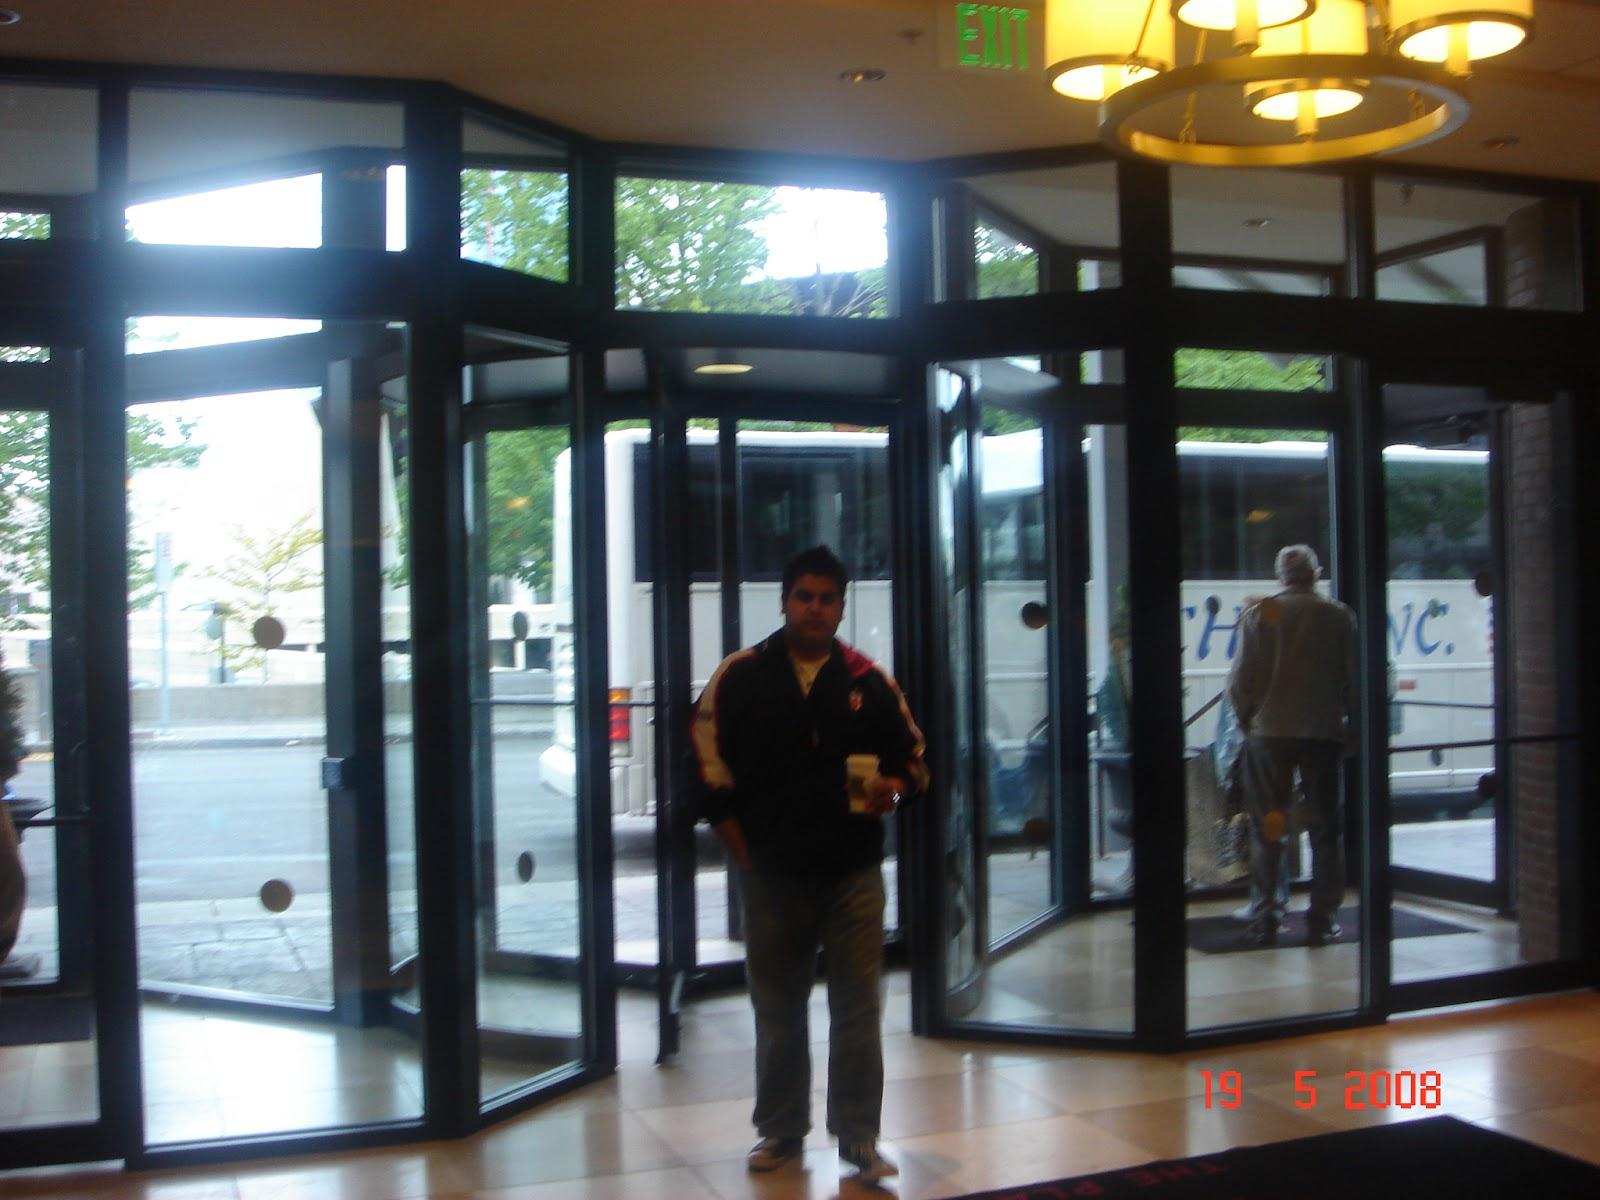 Hotel Crowne Plaza,Niagara Falls